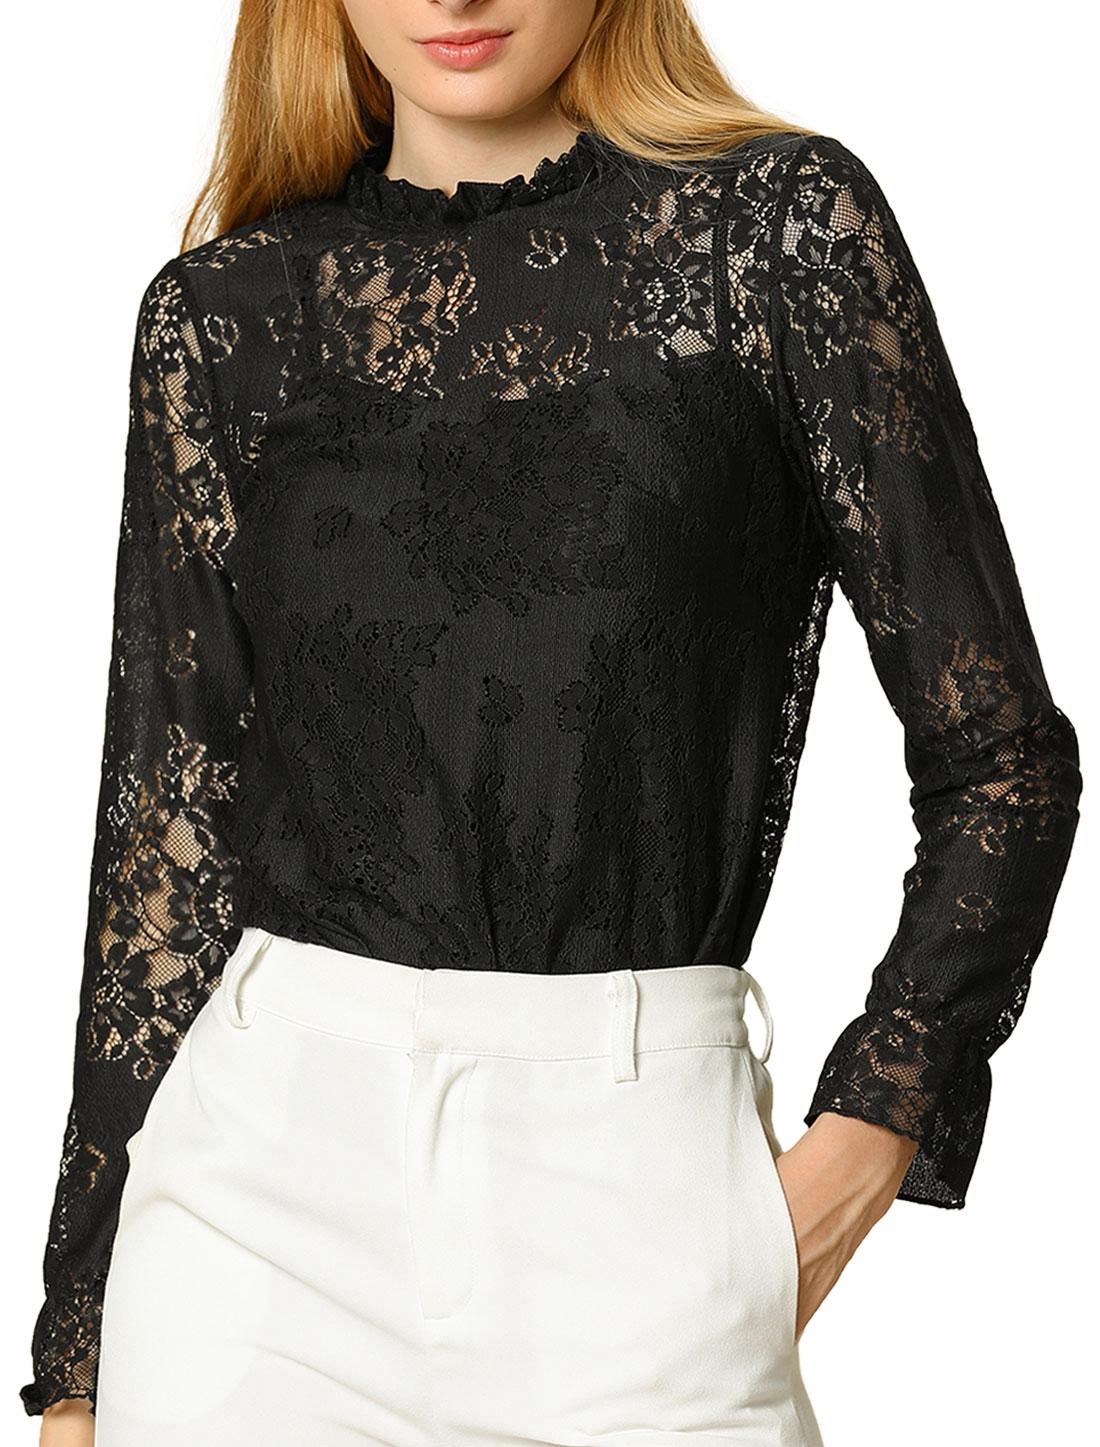 Allegra K Womens Lace Sheer Floral Color Block Blouse Black XL (US 18)